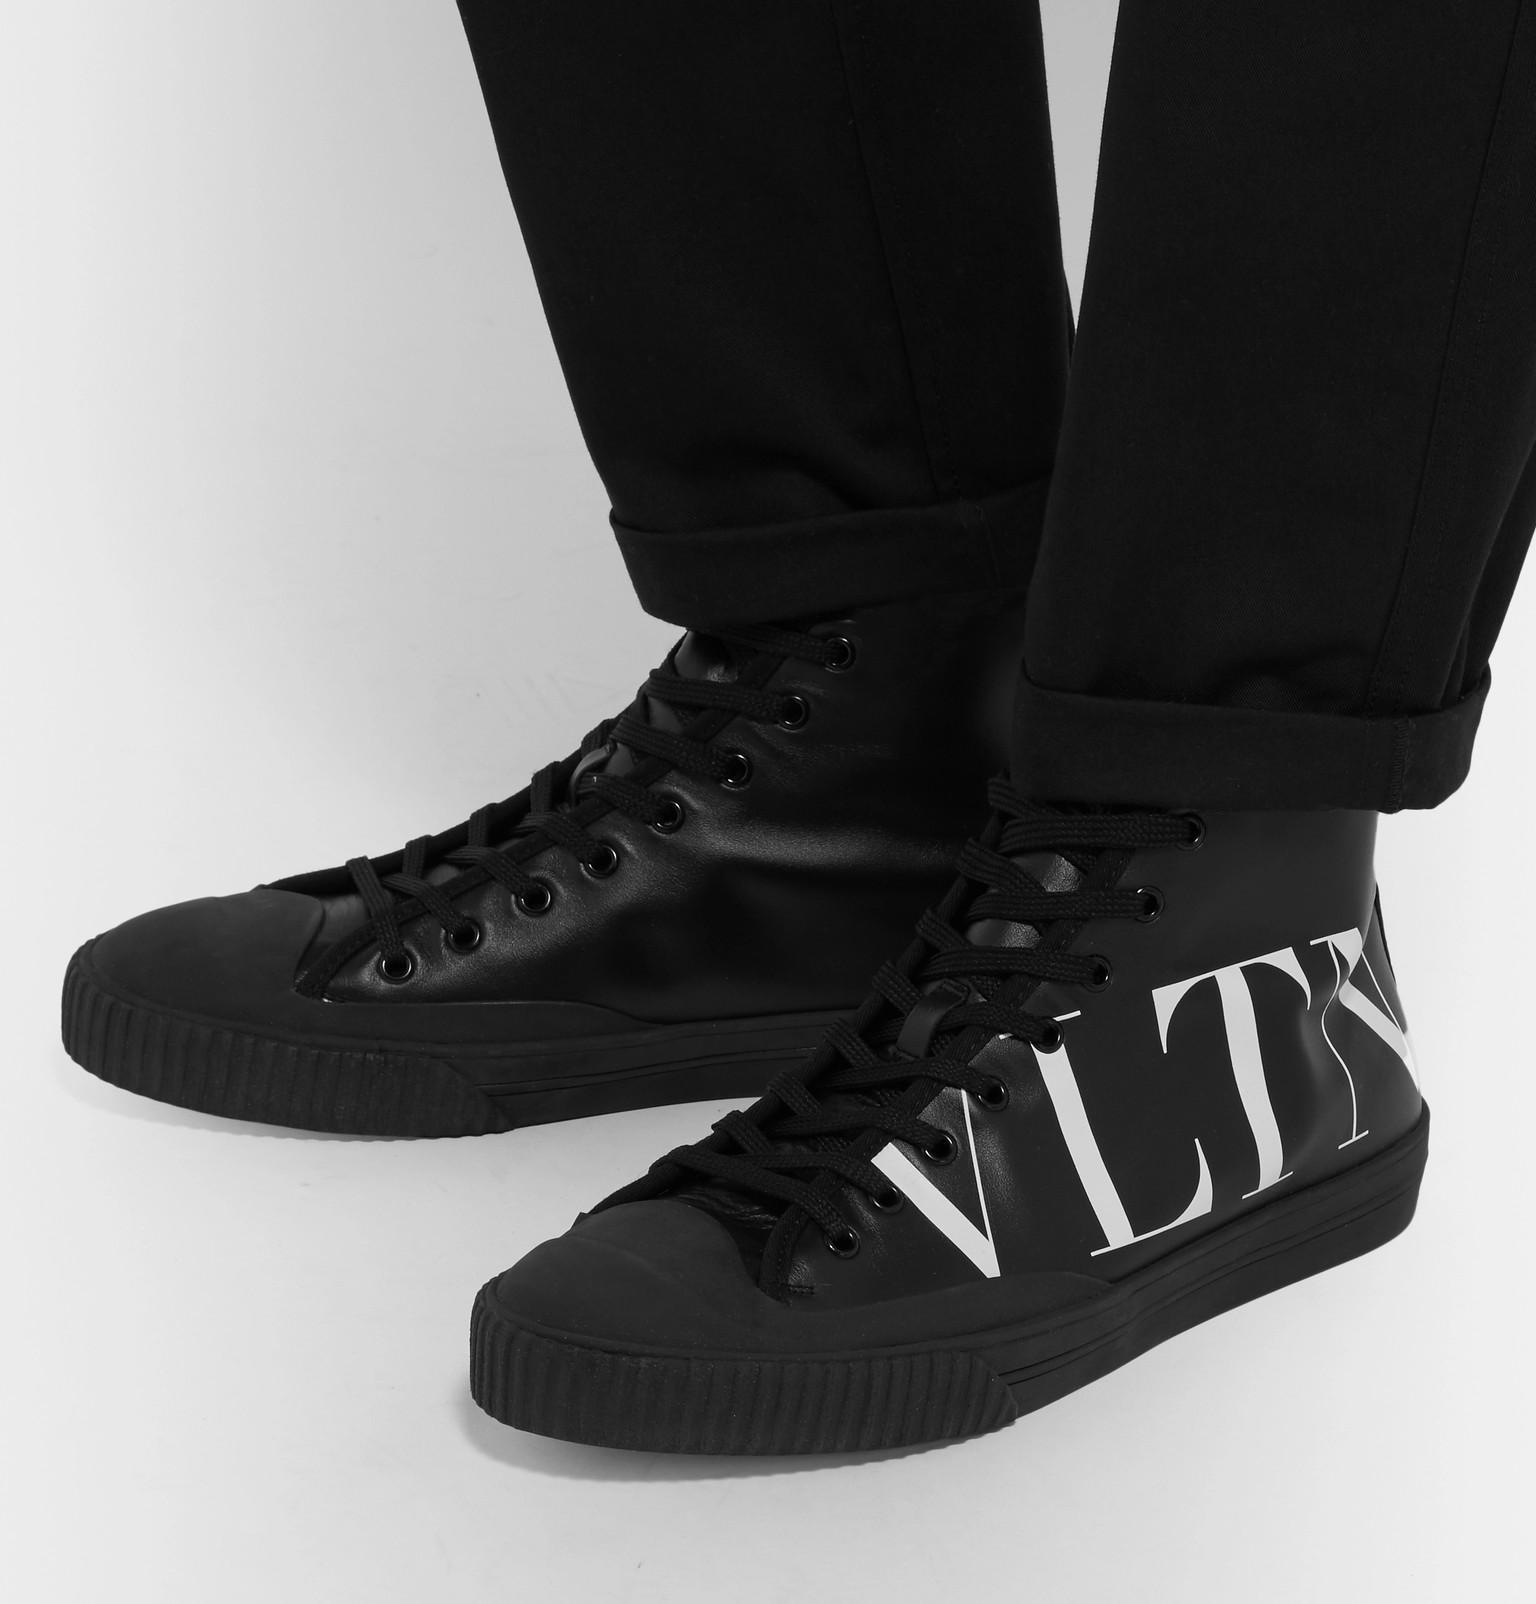 quality design c3afd b64ab valentino-black-Garavani-Logo-print-Leather-High-top-Sneakers.jpeg